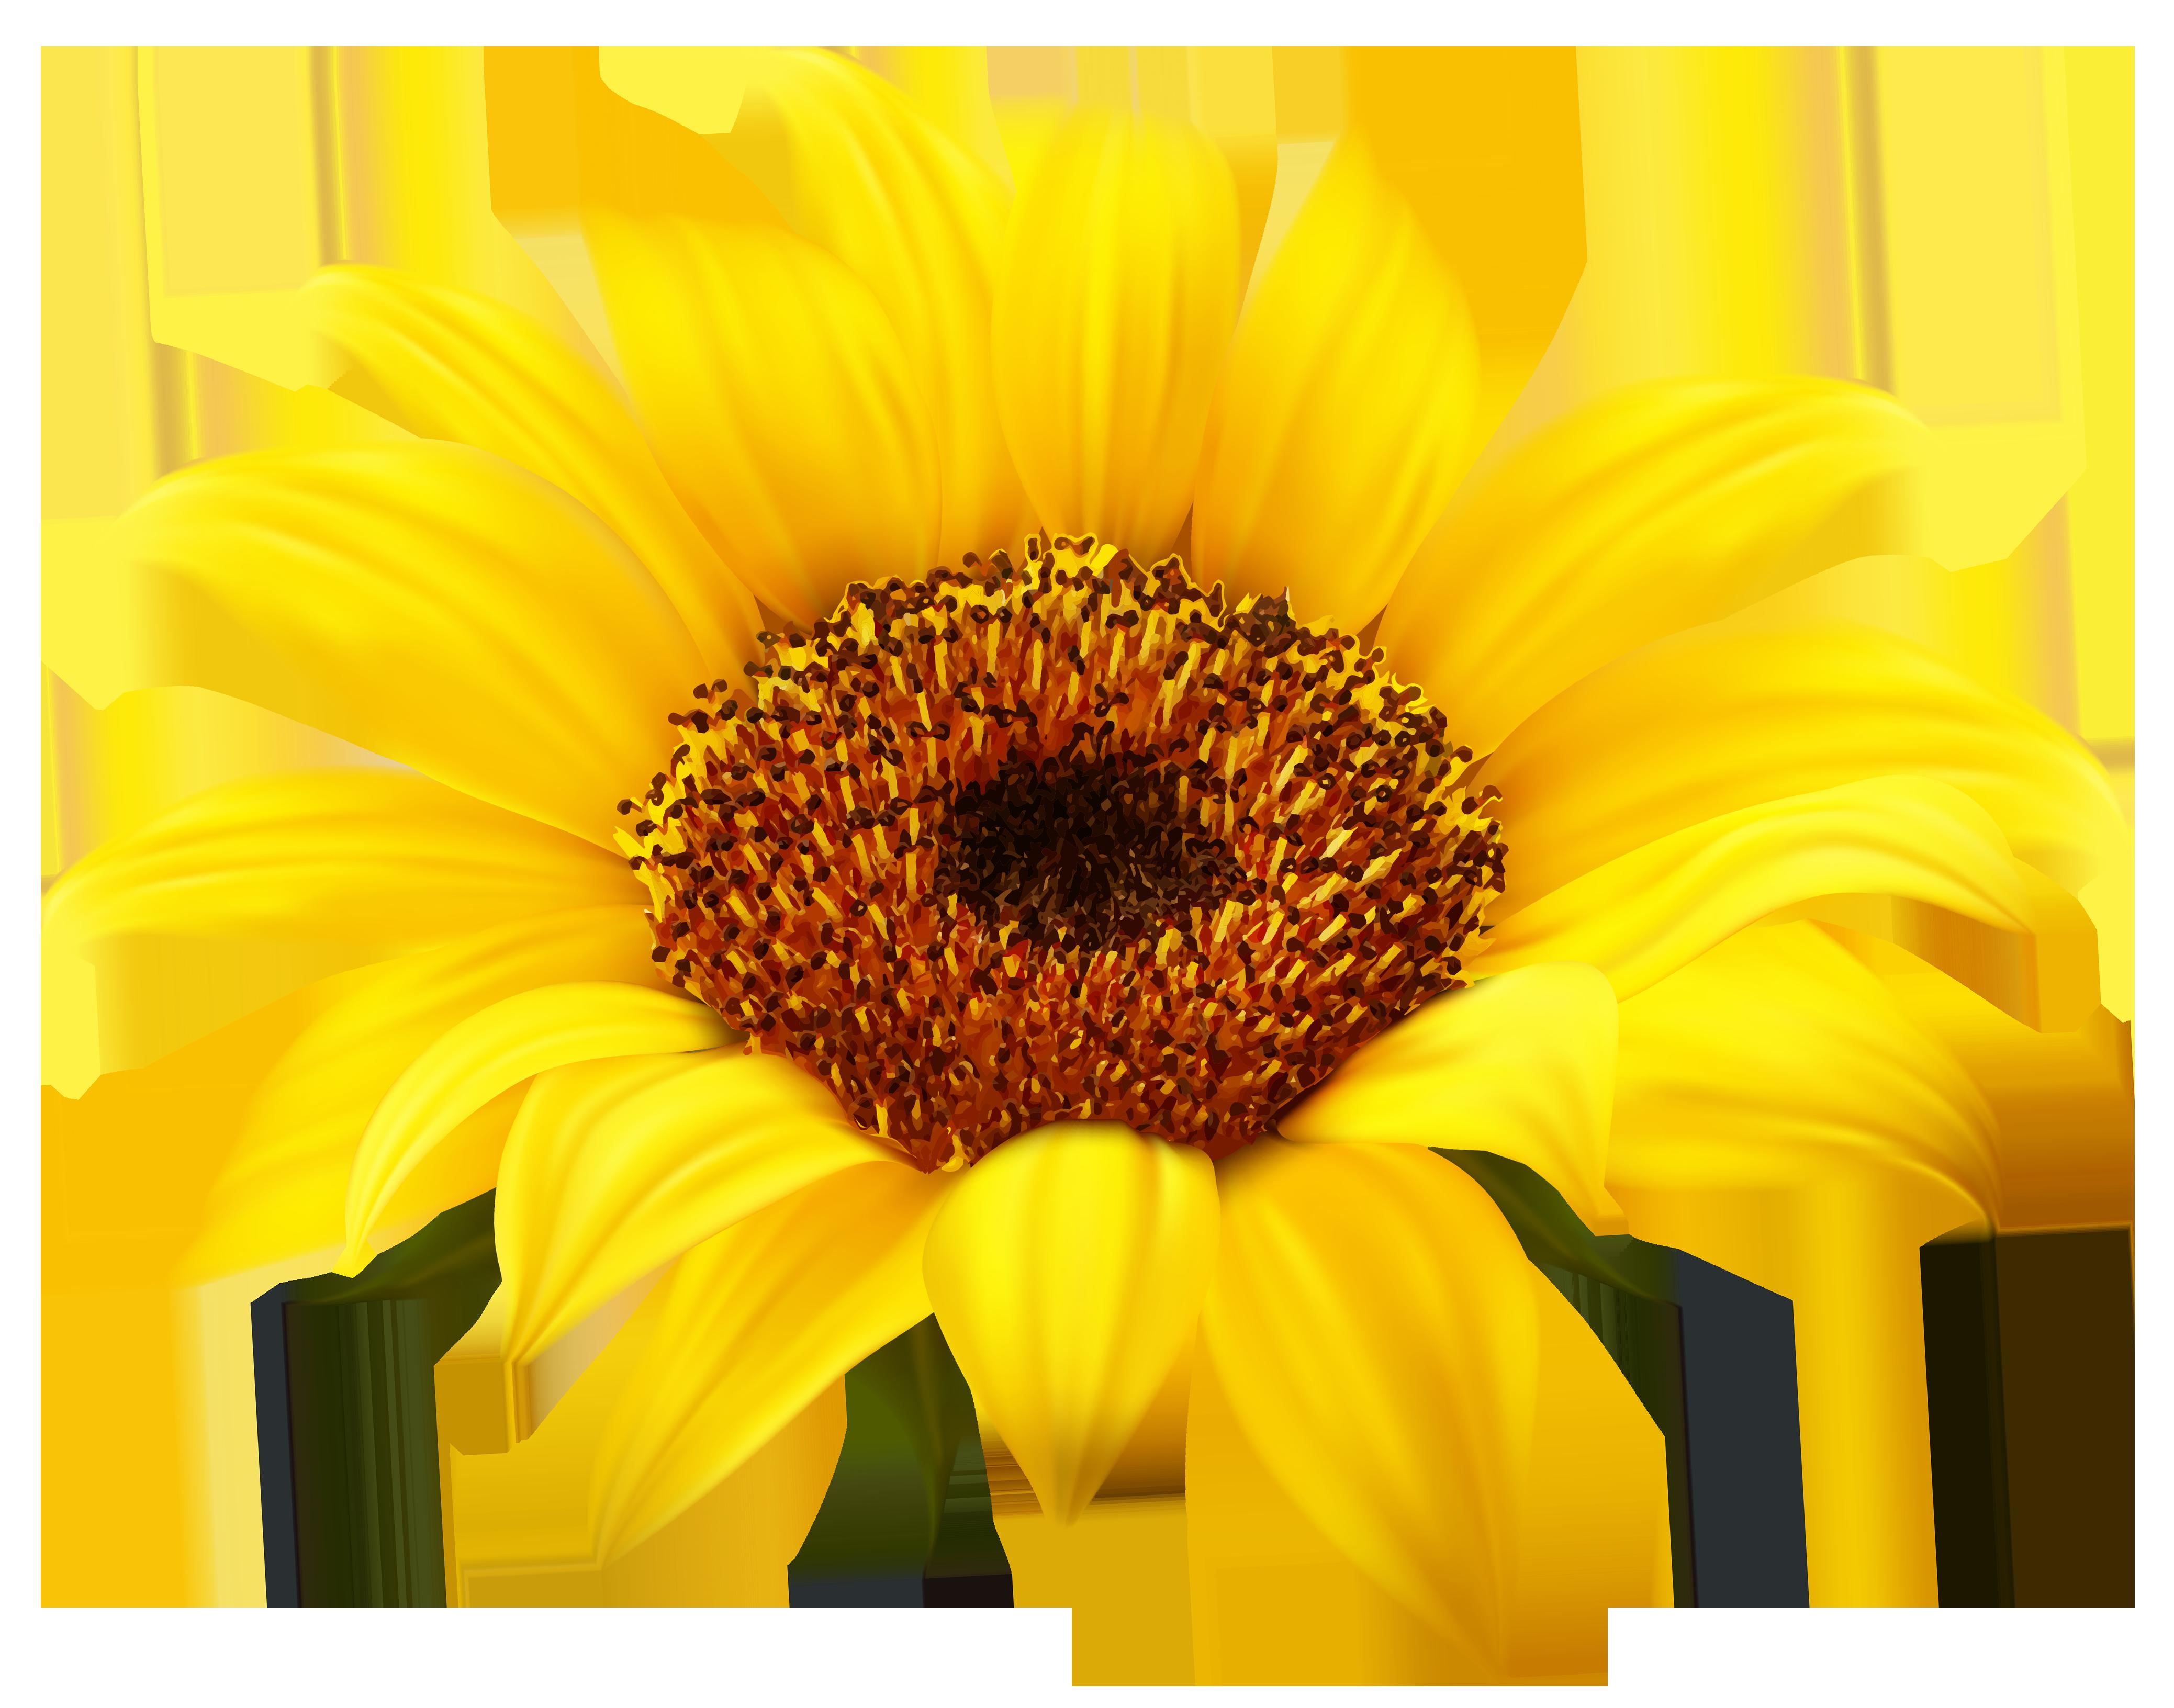 Sun flower seed clipart image transparent sunflower clipart #60 | 56 Sunflower Clipart | Clipart Fans image transparent